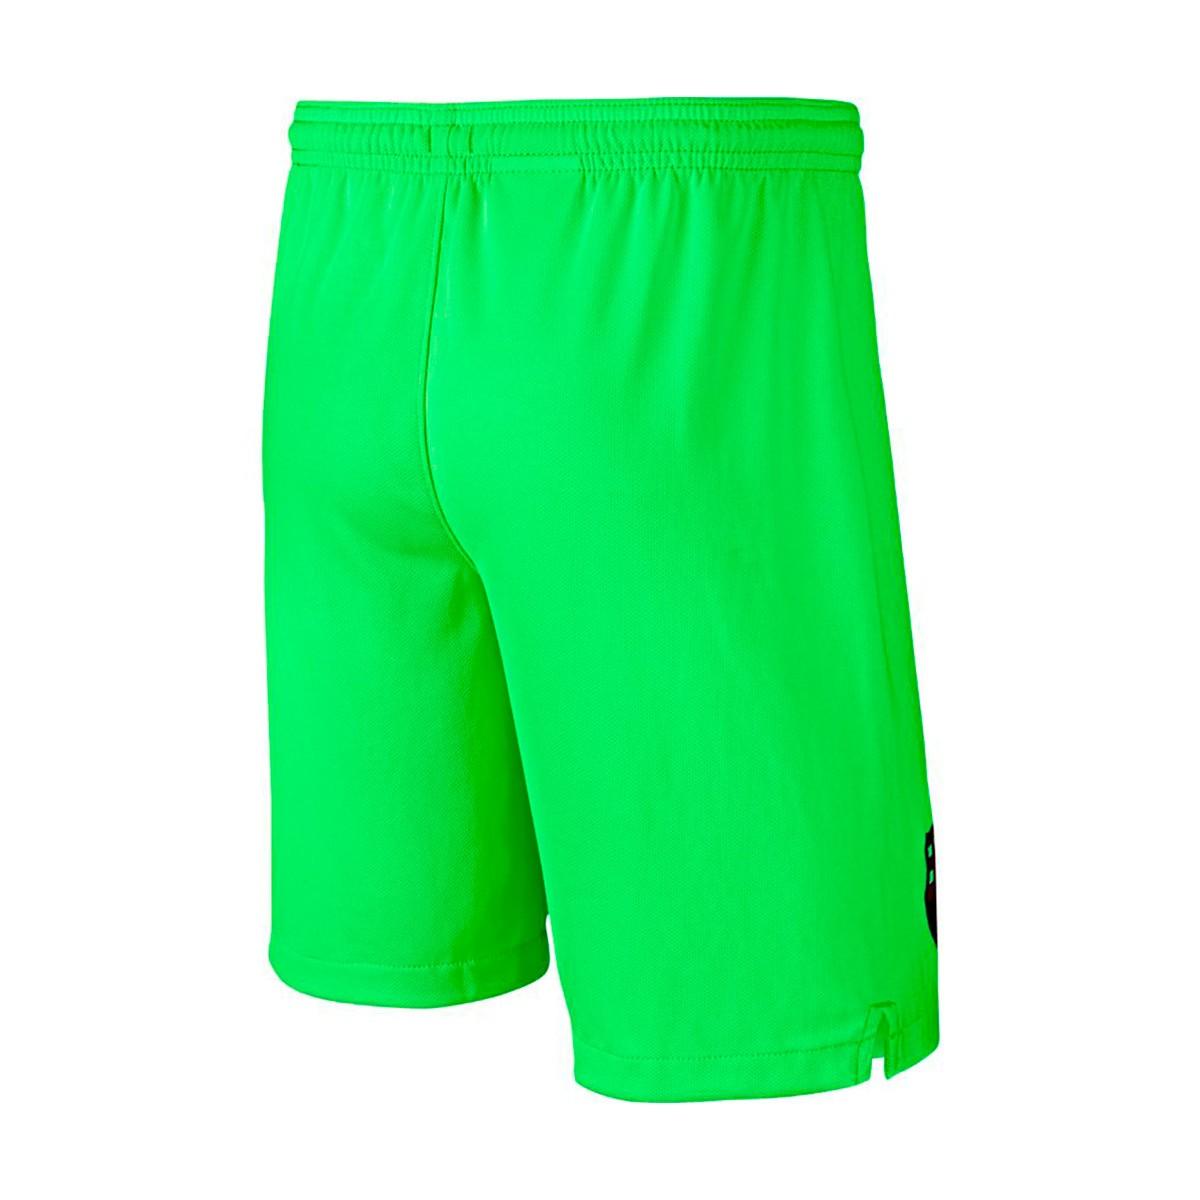 09d0a2646239 Nike Kids Goalkeeper FC Barcelona Stadium 2018-2019 Home Shorts. Green  strike-Black ...